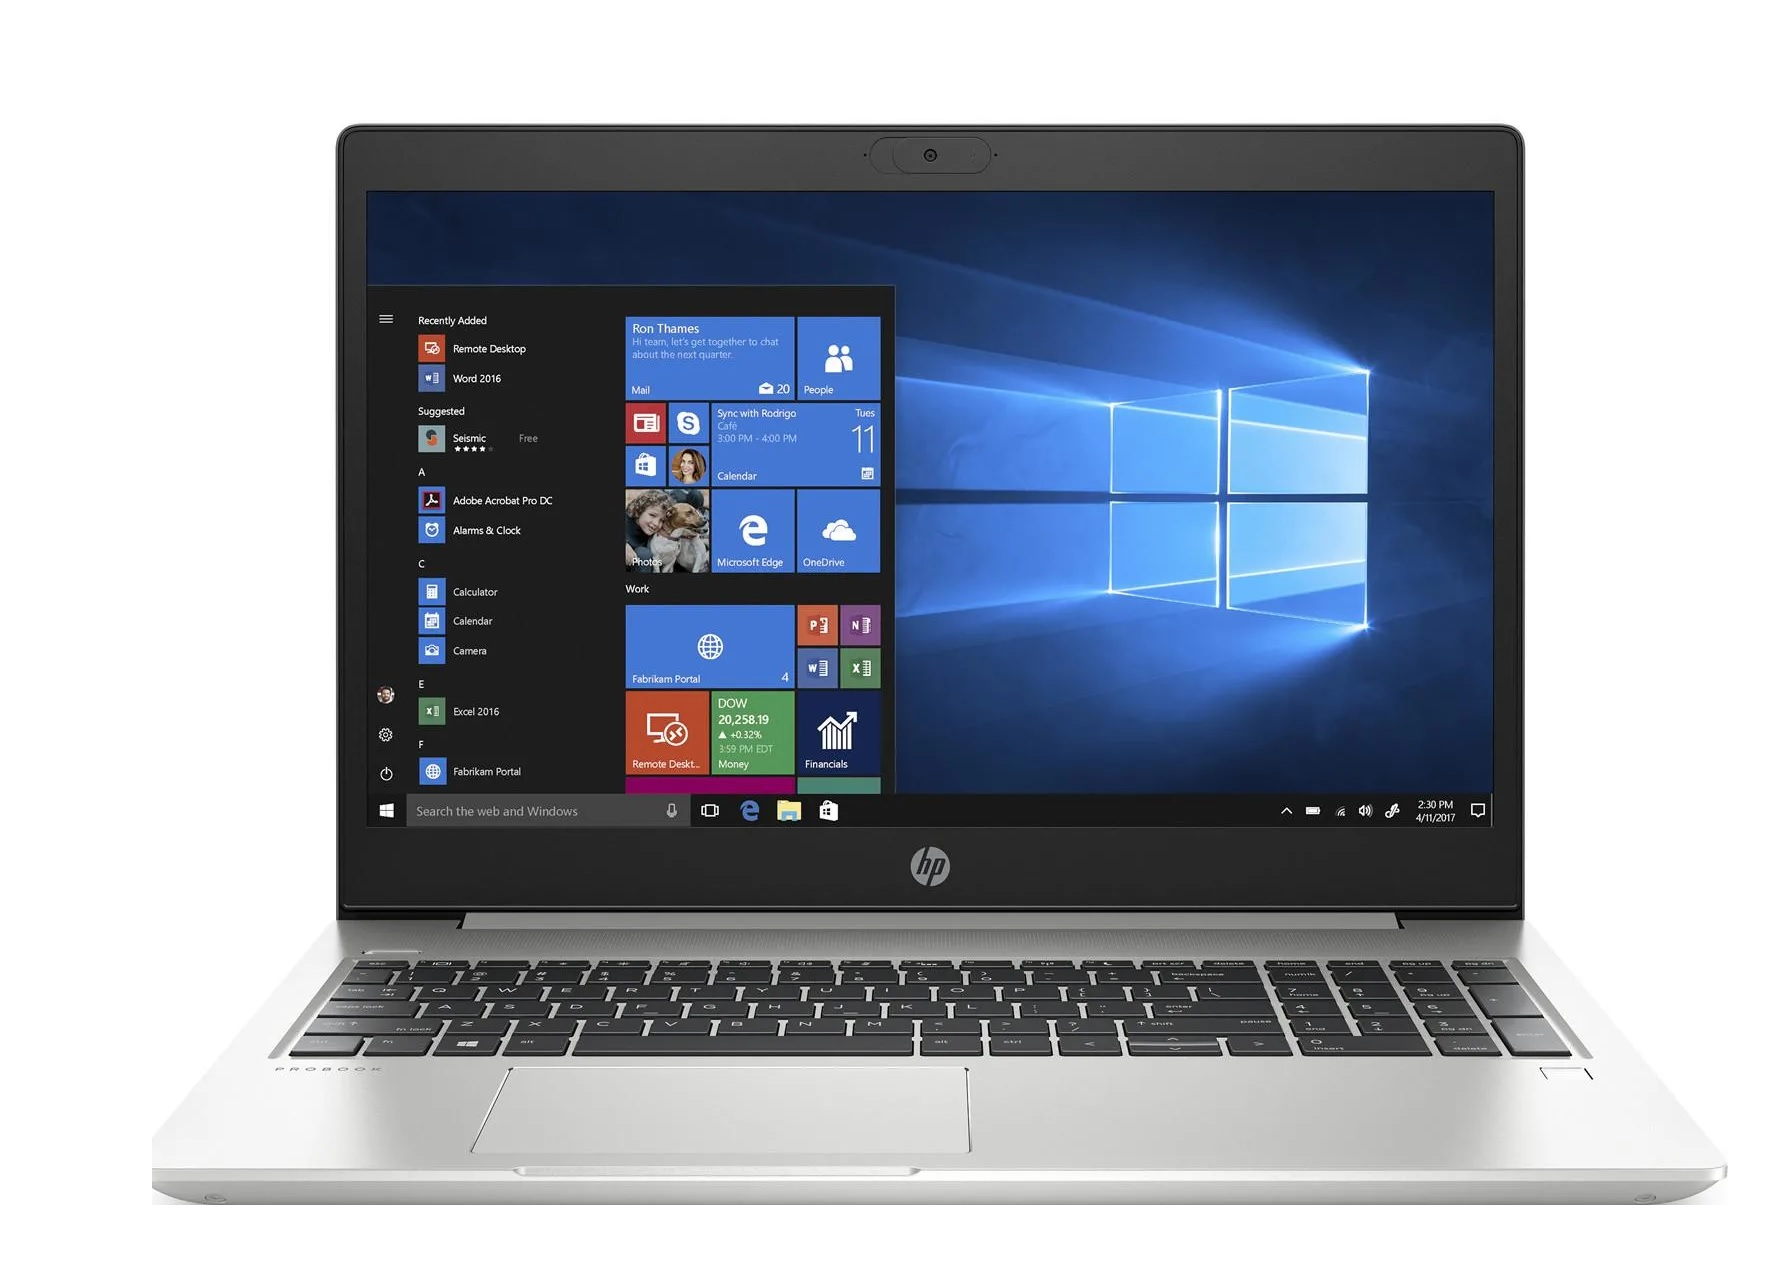 HP Probook 450 G7 15 inch Laptop